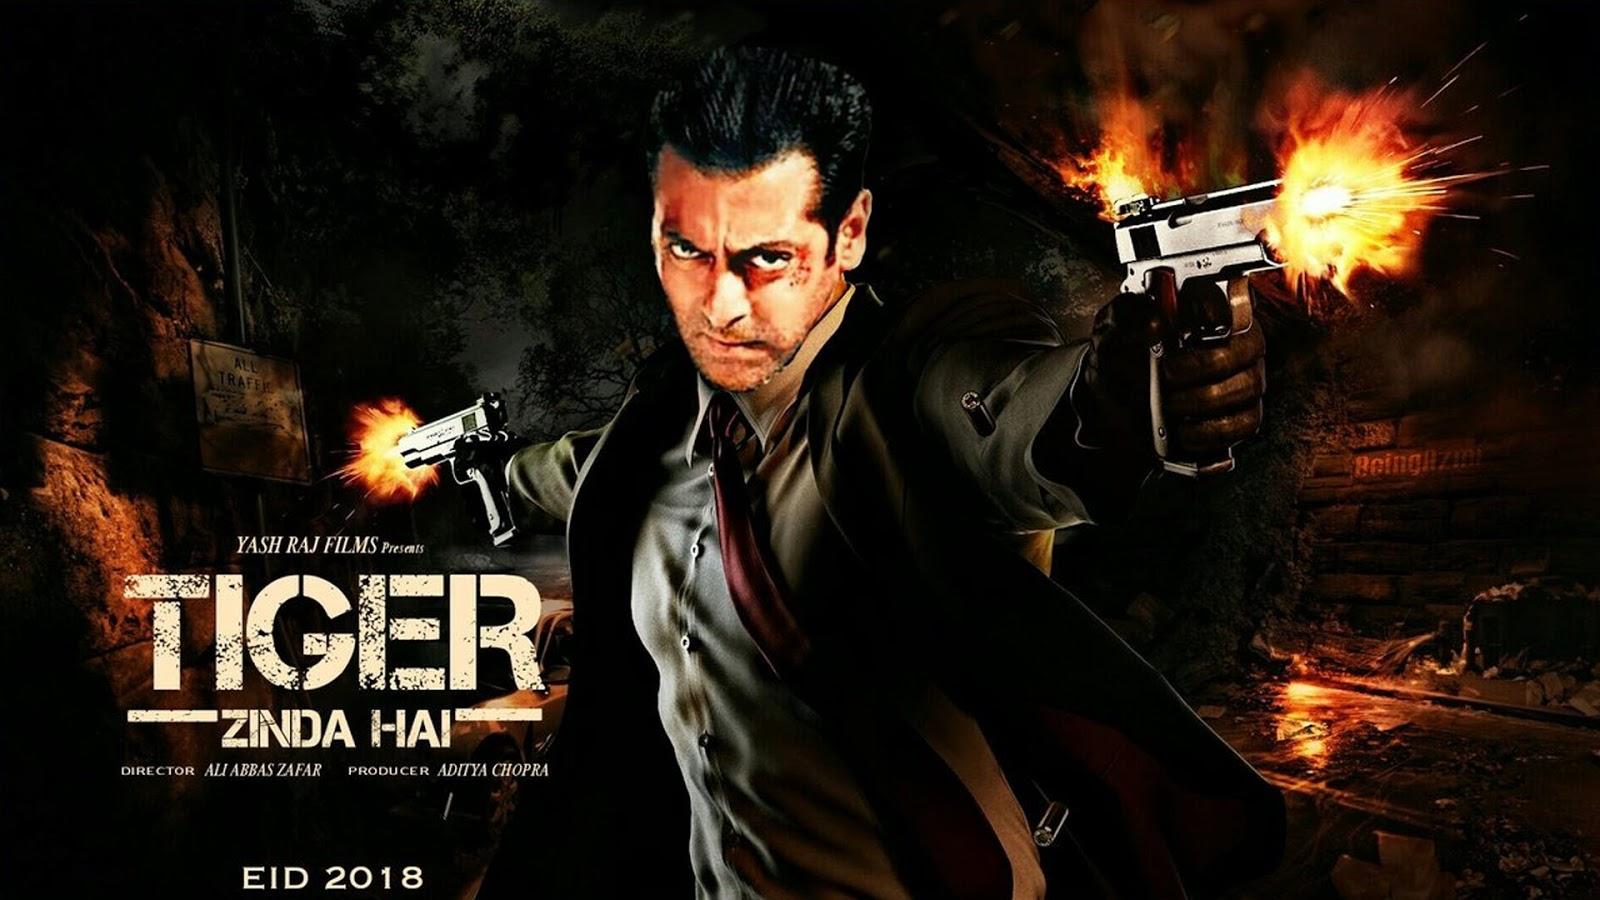 Tiger Zinda Hai Movie Hd Wallpapers Download Free 1080p All Hd